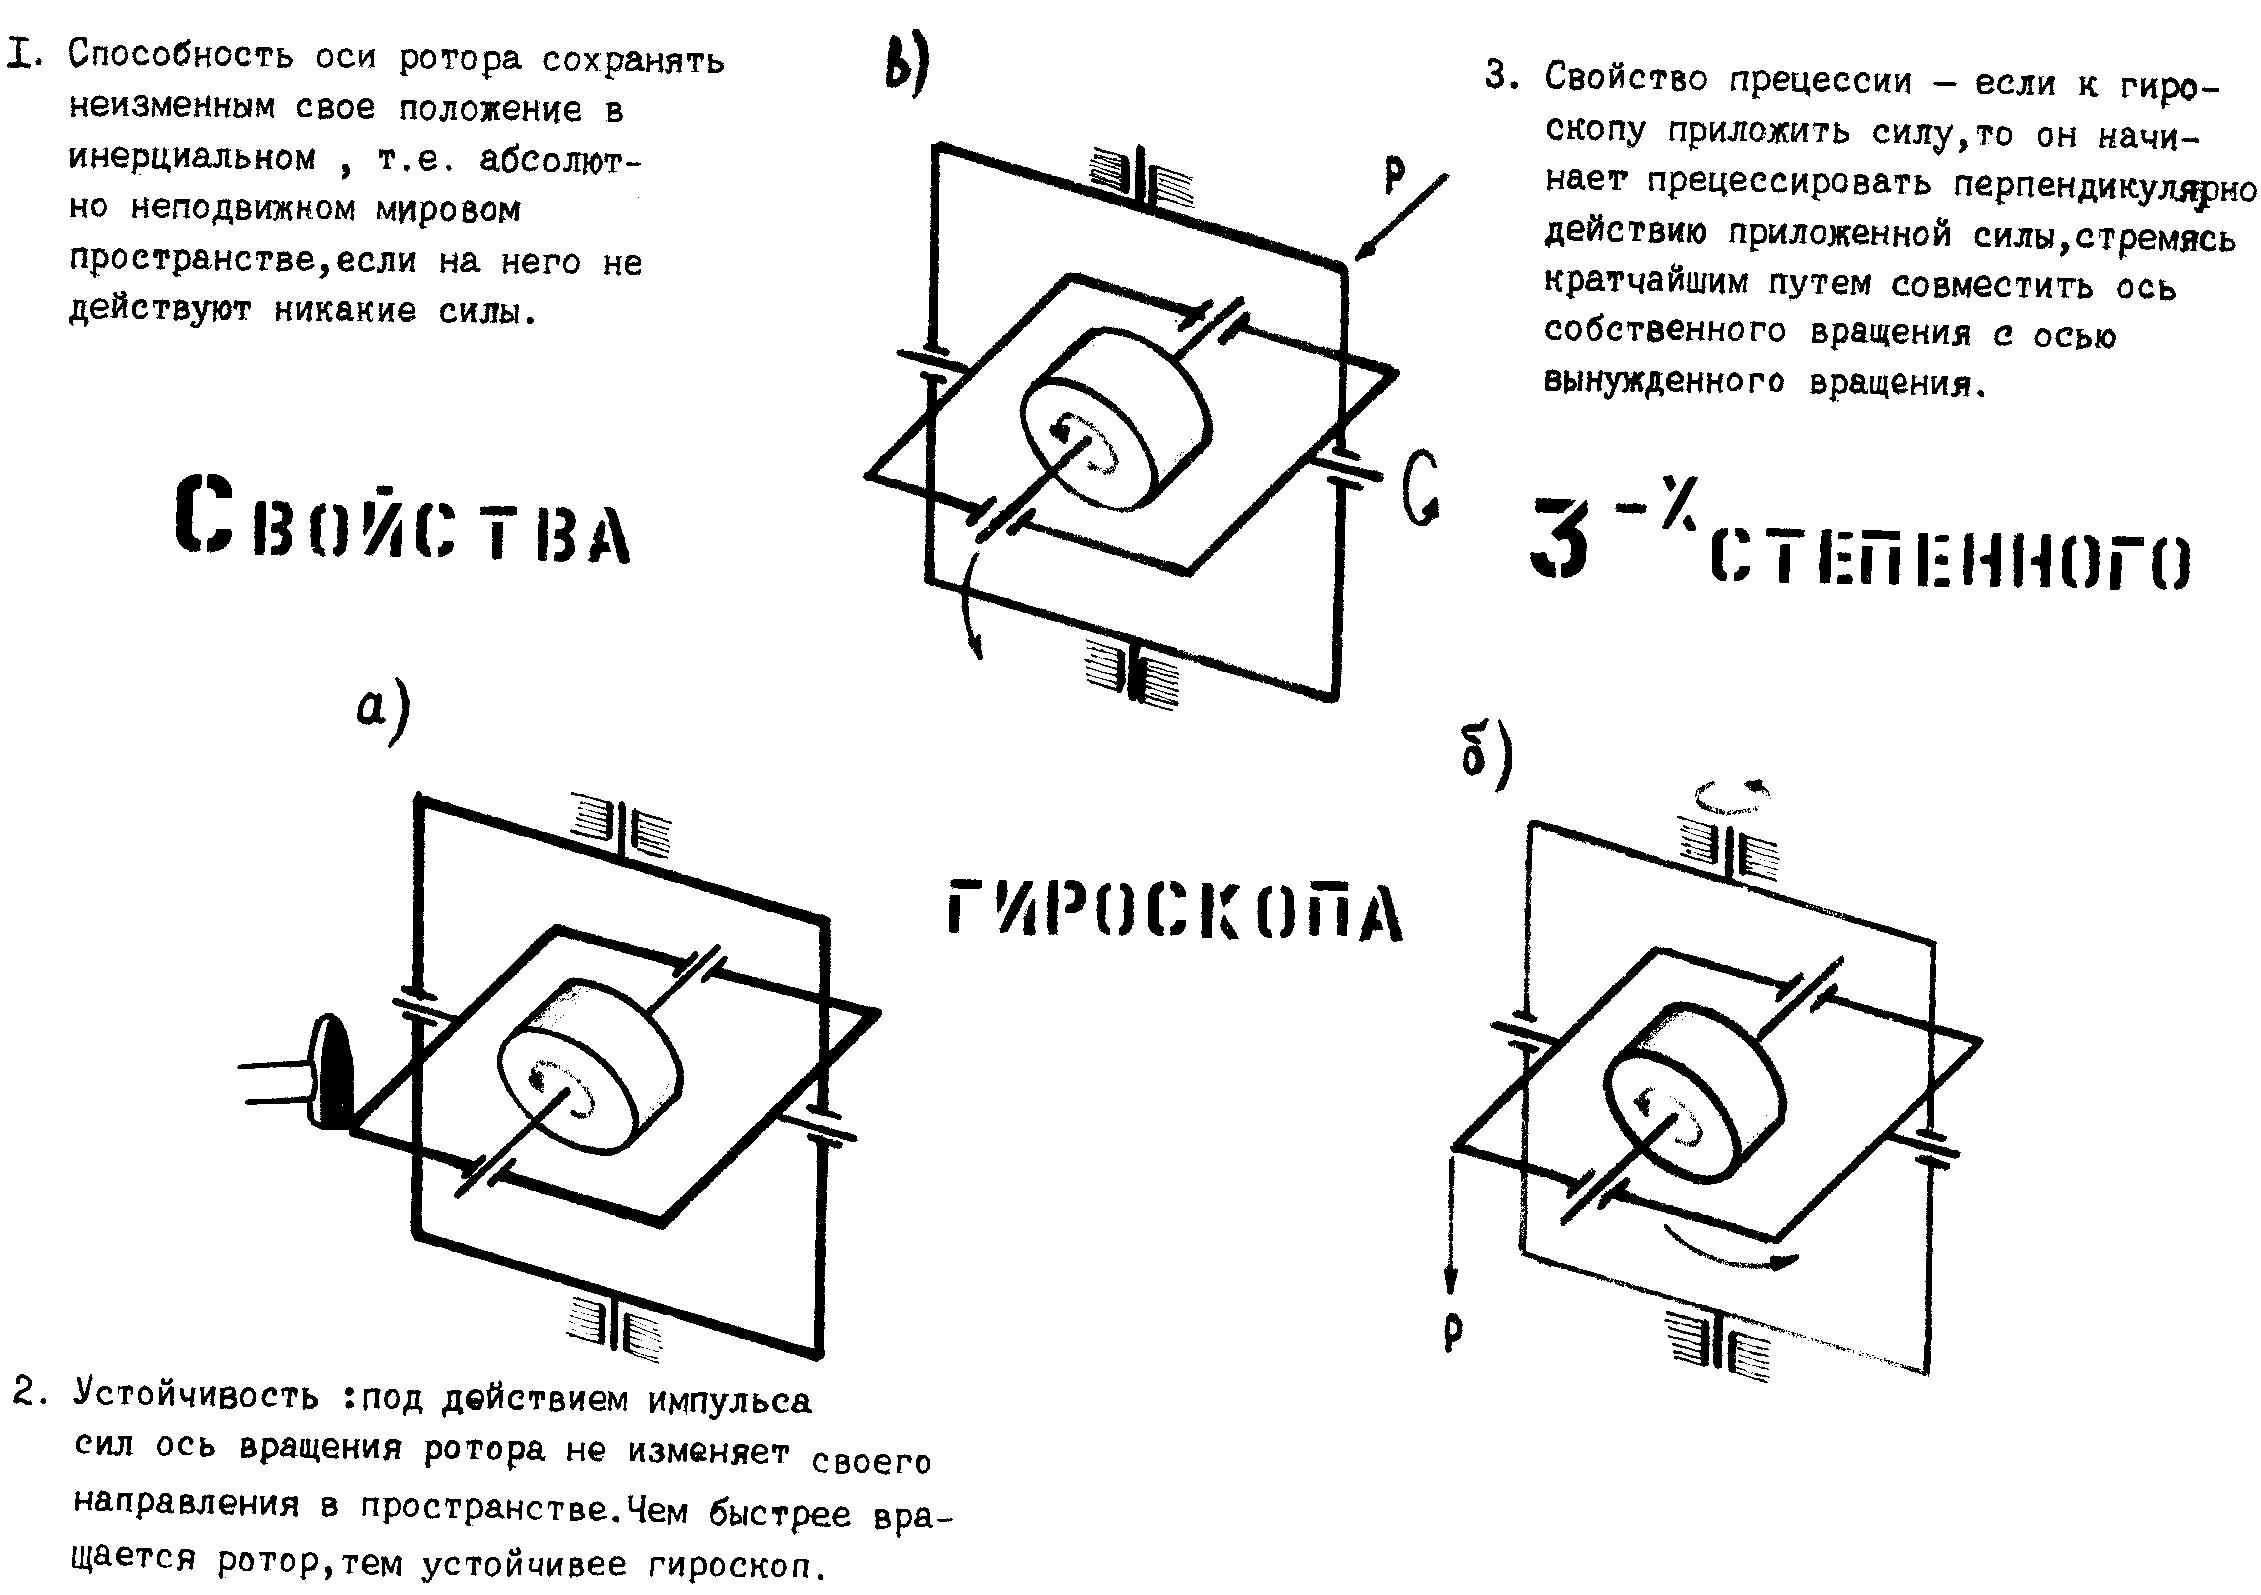 https://konspekta.net/infopediasu/baza14/274833251820.files/image002.png